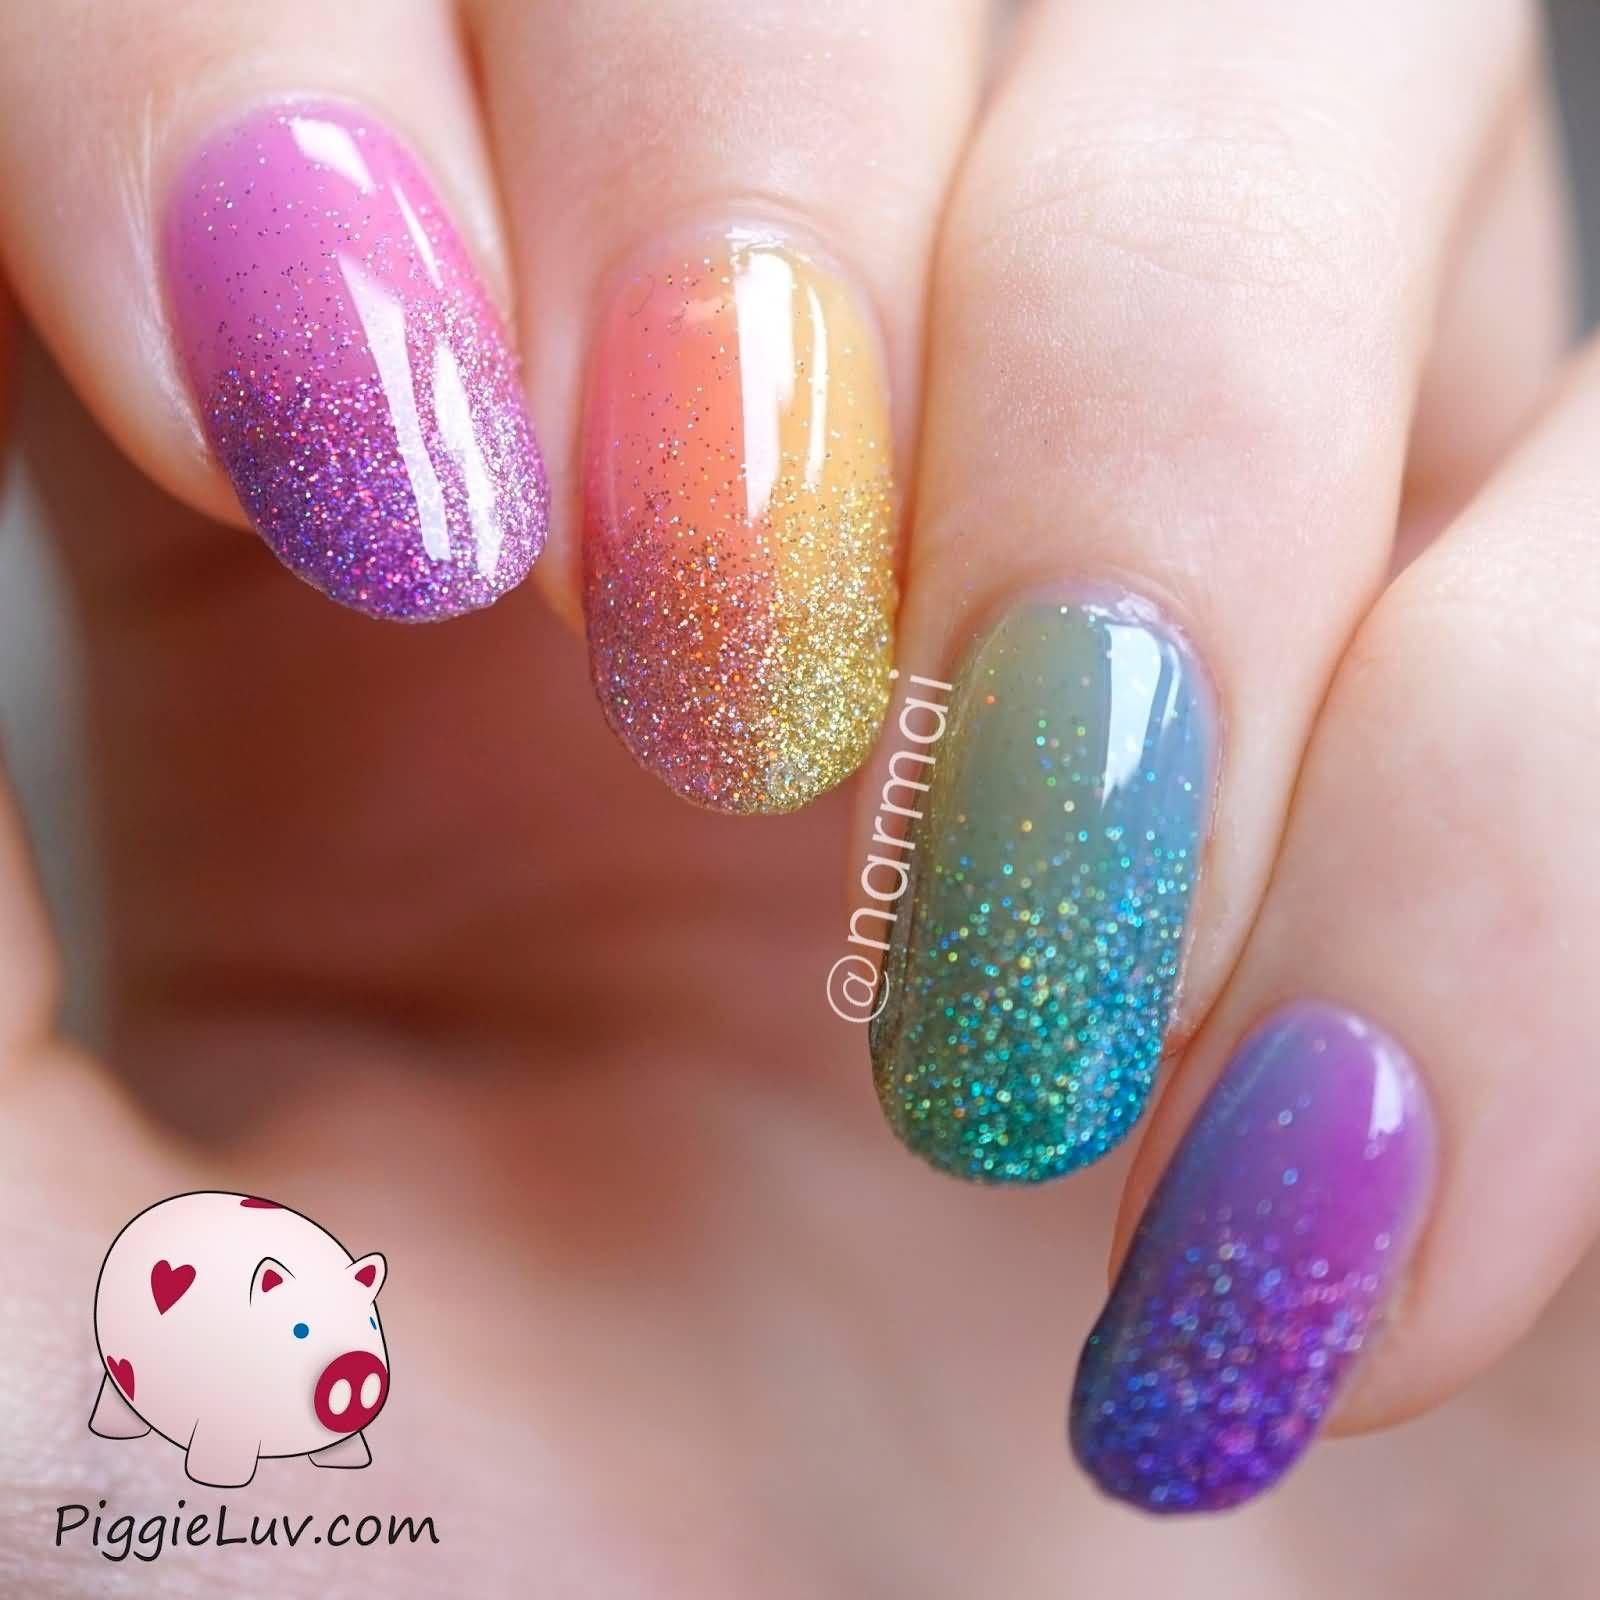 Rainbow Glitter Gel Nail Art Design Idea Rainbow Nail Art Unicorn Nails Designs Rainbow Nails